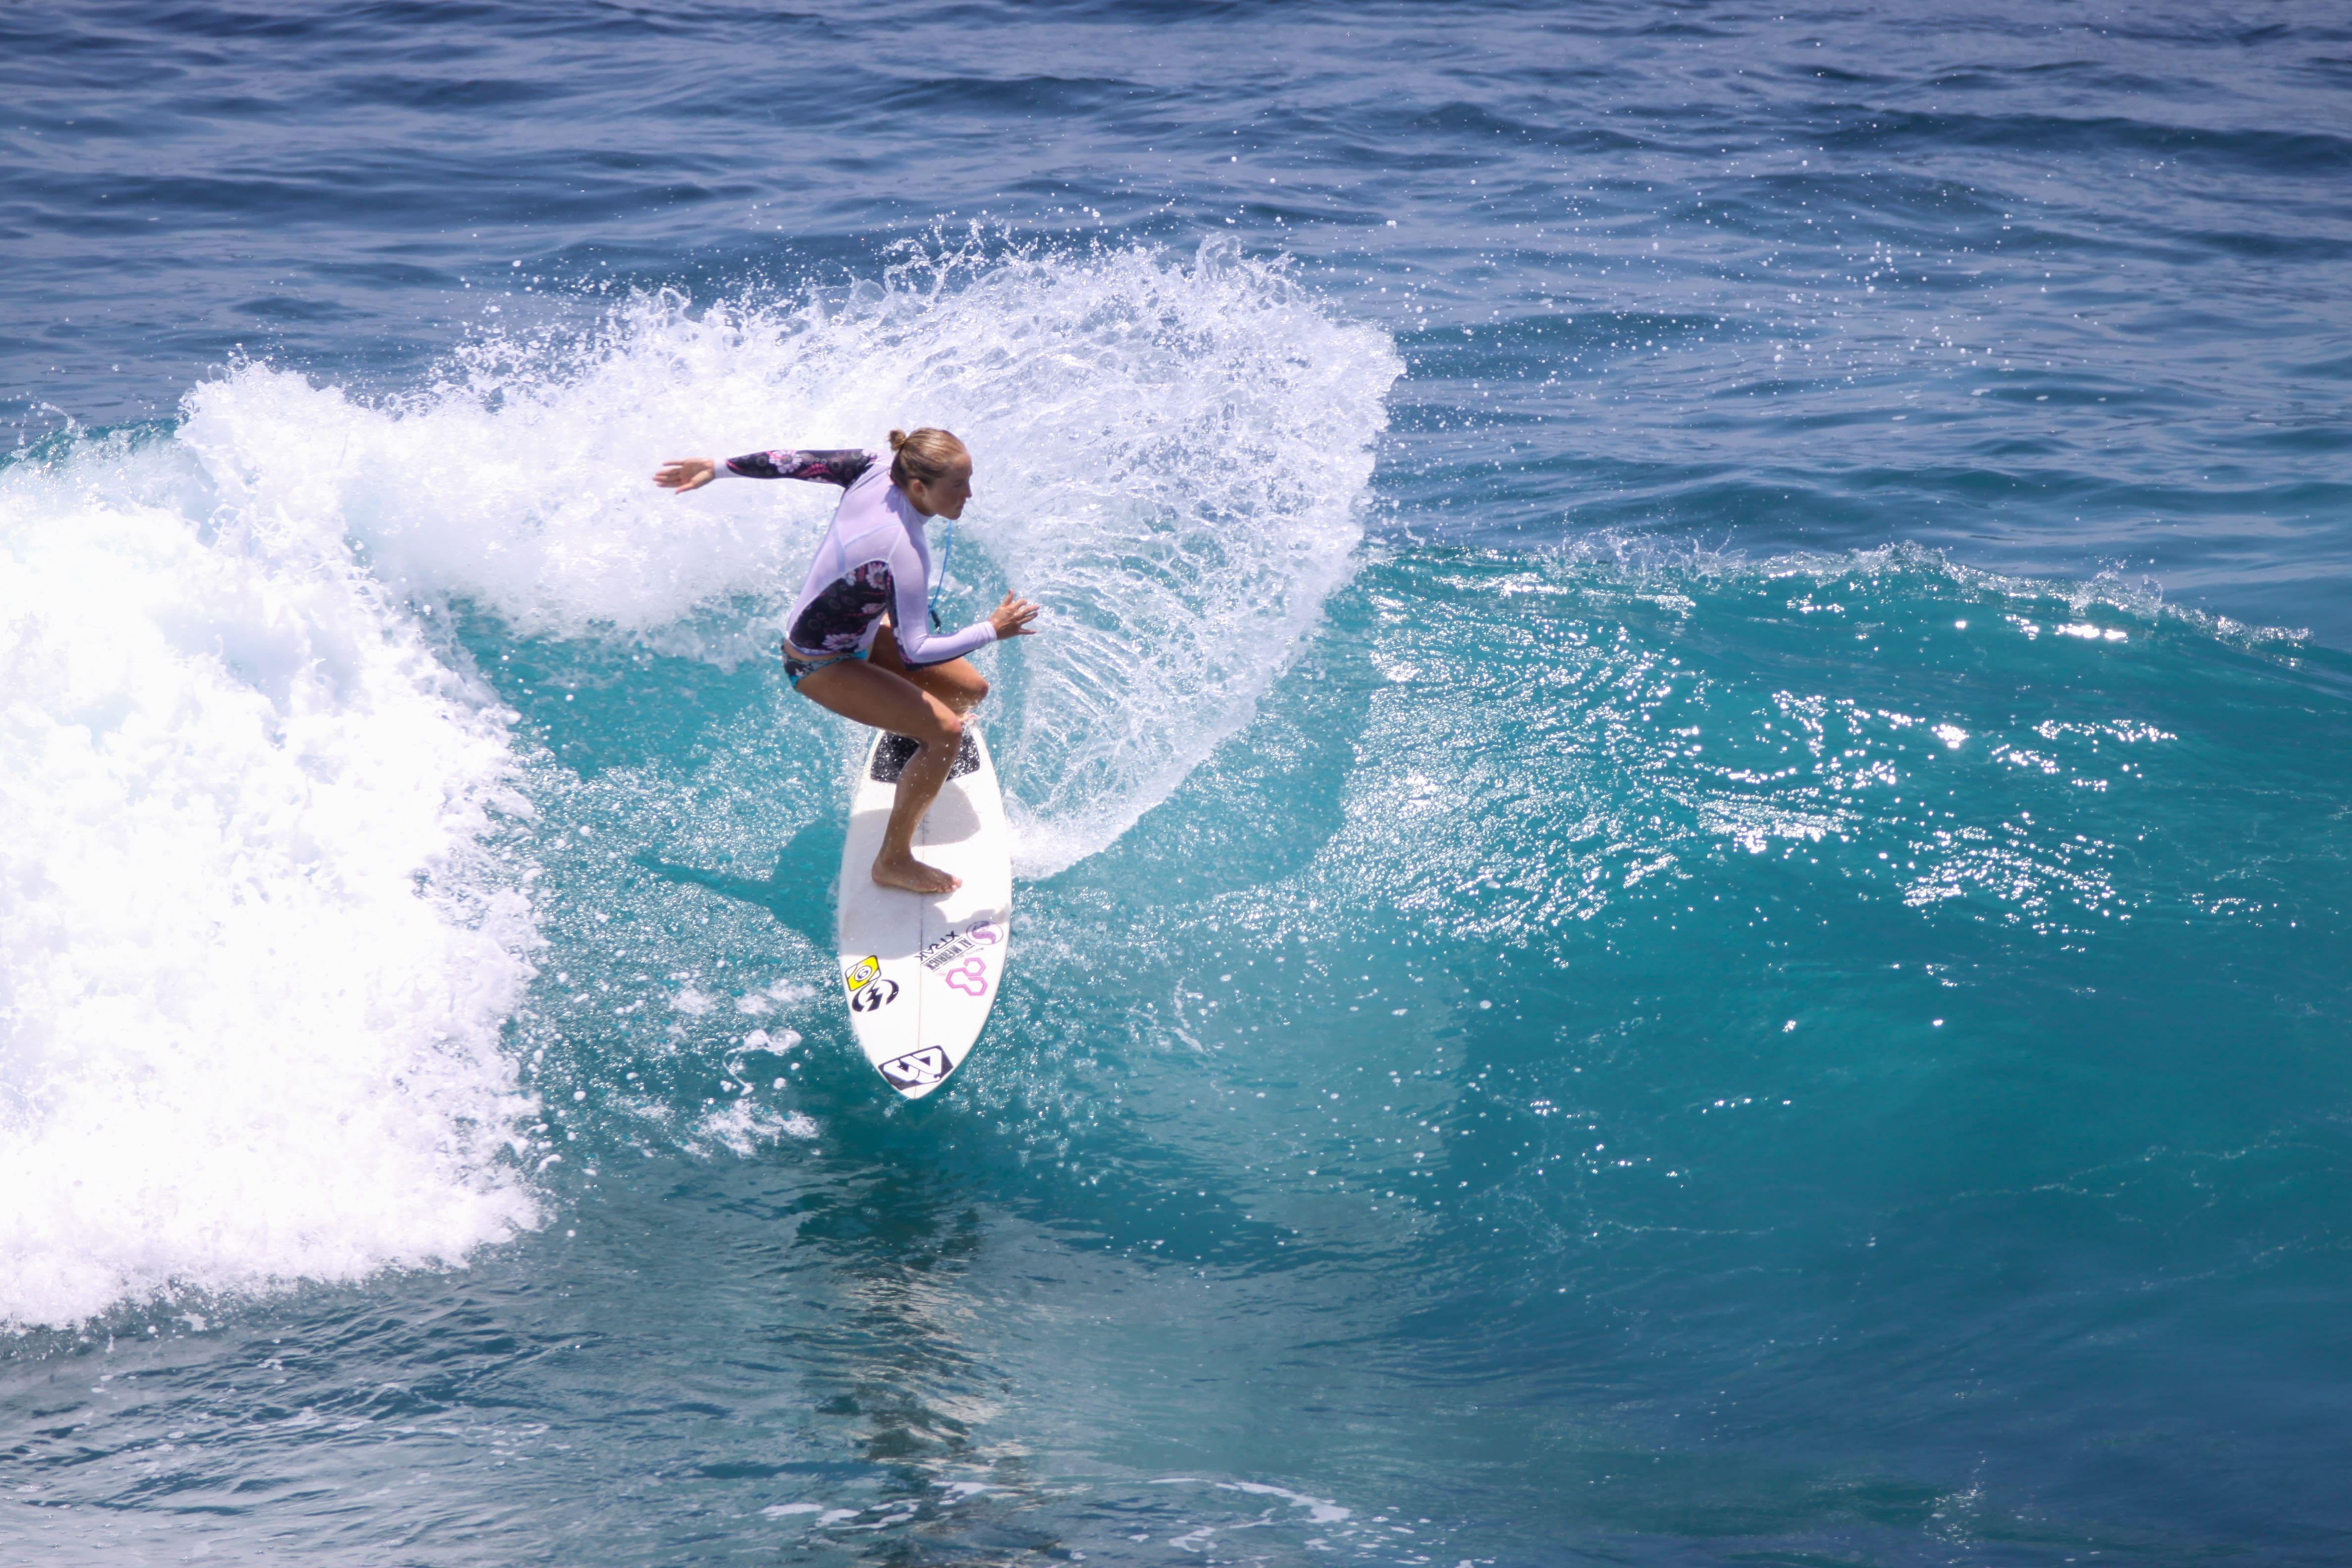 IWD 2021 Femmes en surf